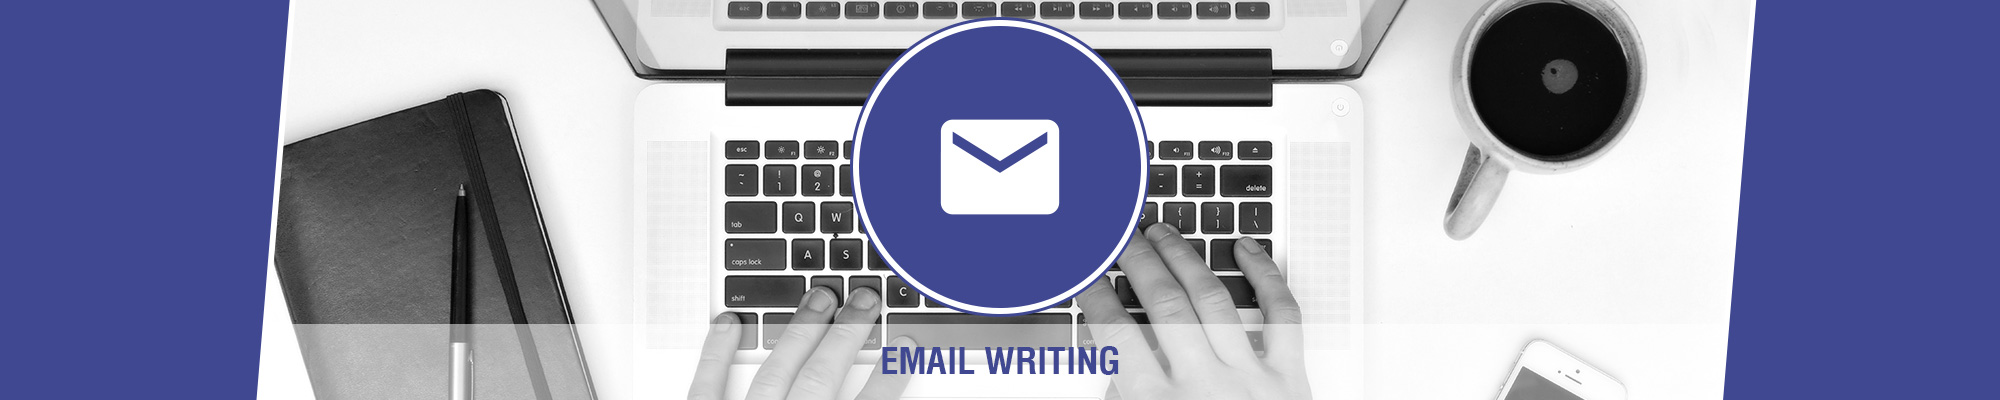 Anglokom Corporate Language Training in Bangkok - Email Writing in English Banner